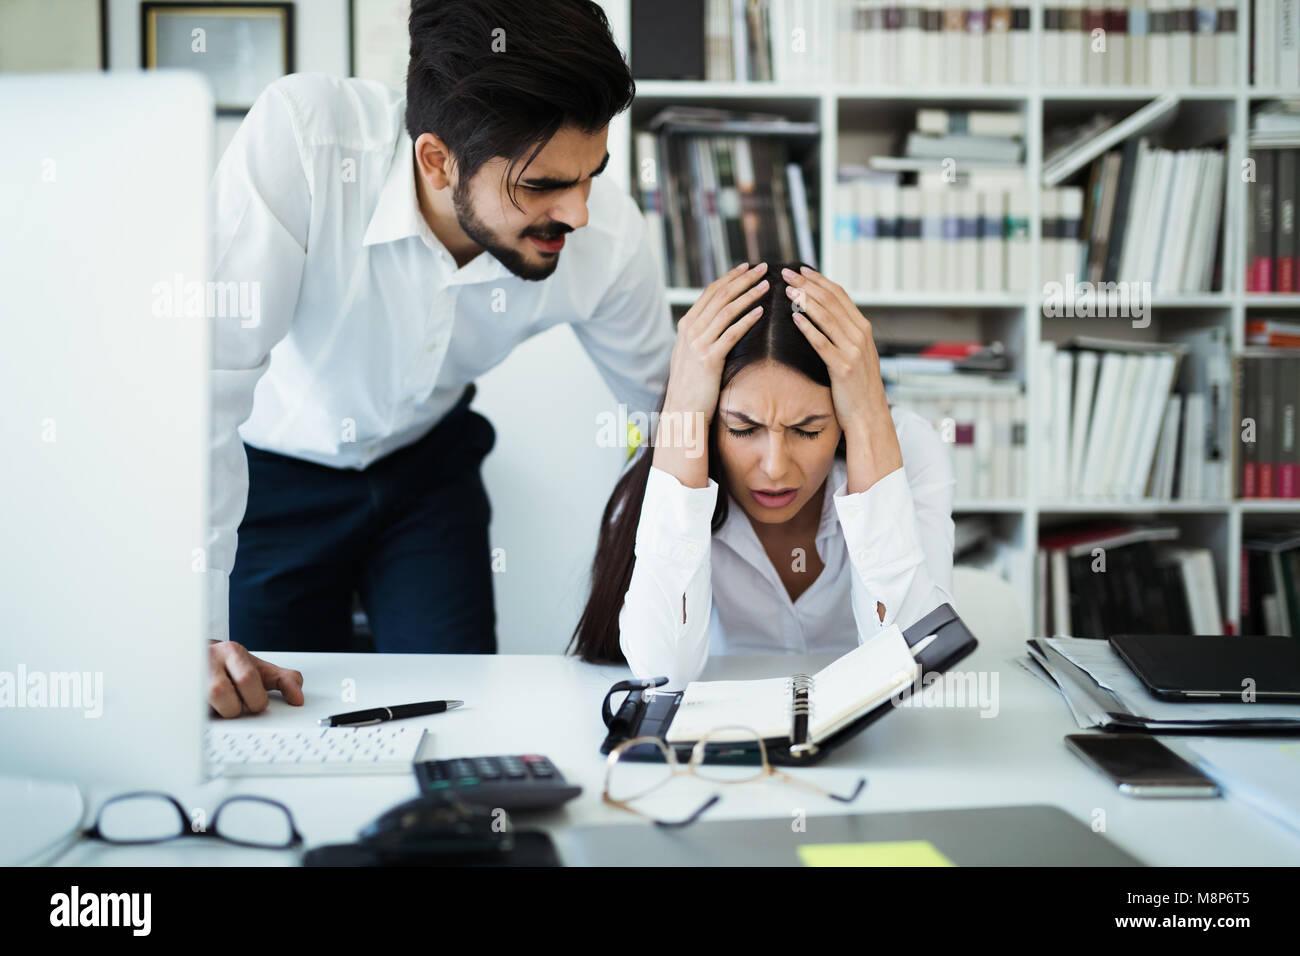 Enojado irritado boss reprender empleado miedo a ser despedidos, acusándolo de error en informe, mala labor Imagen De Stock